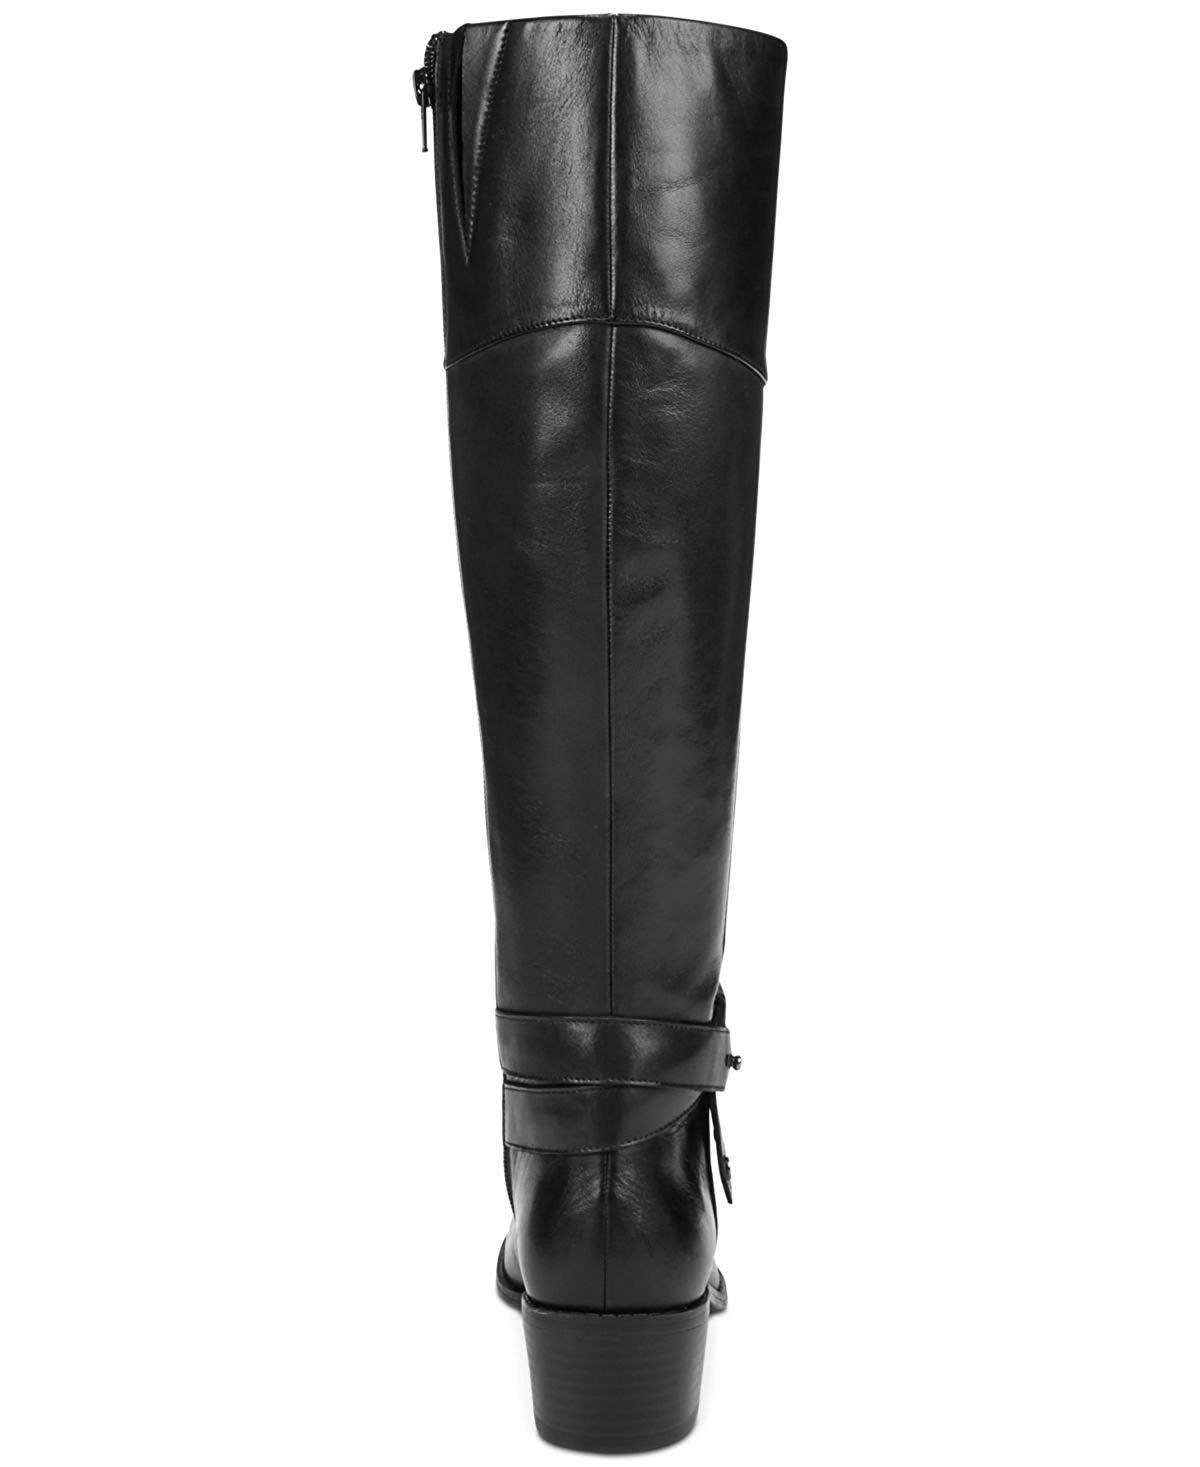 31d9c9a2468d Alfani Womens Berniee Wide Calf Leather Round Toe Knee High